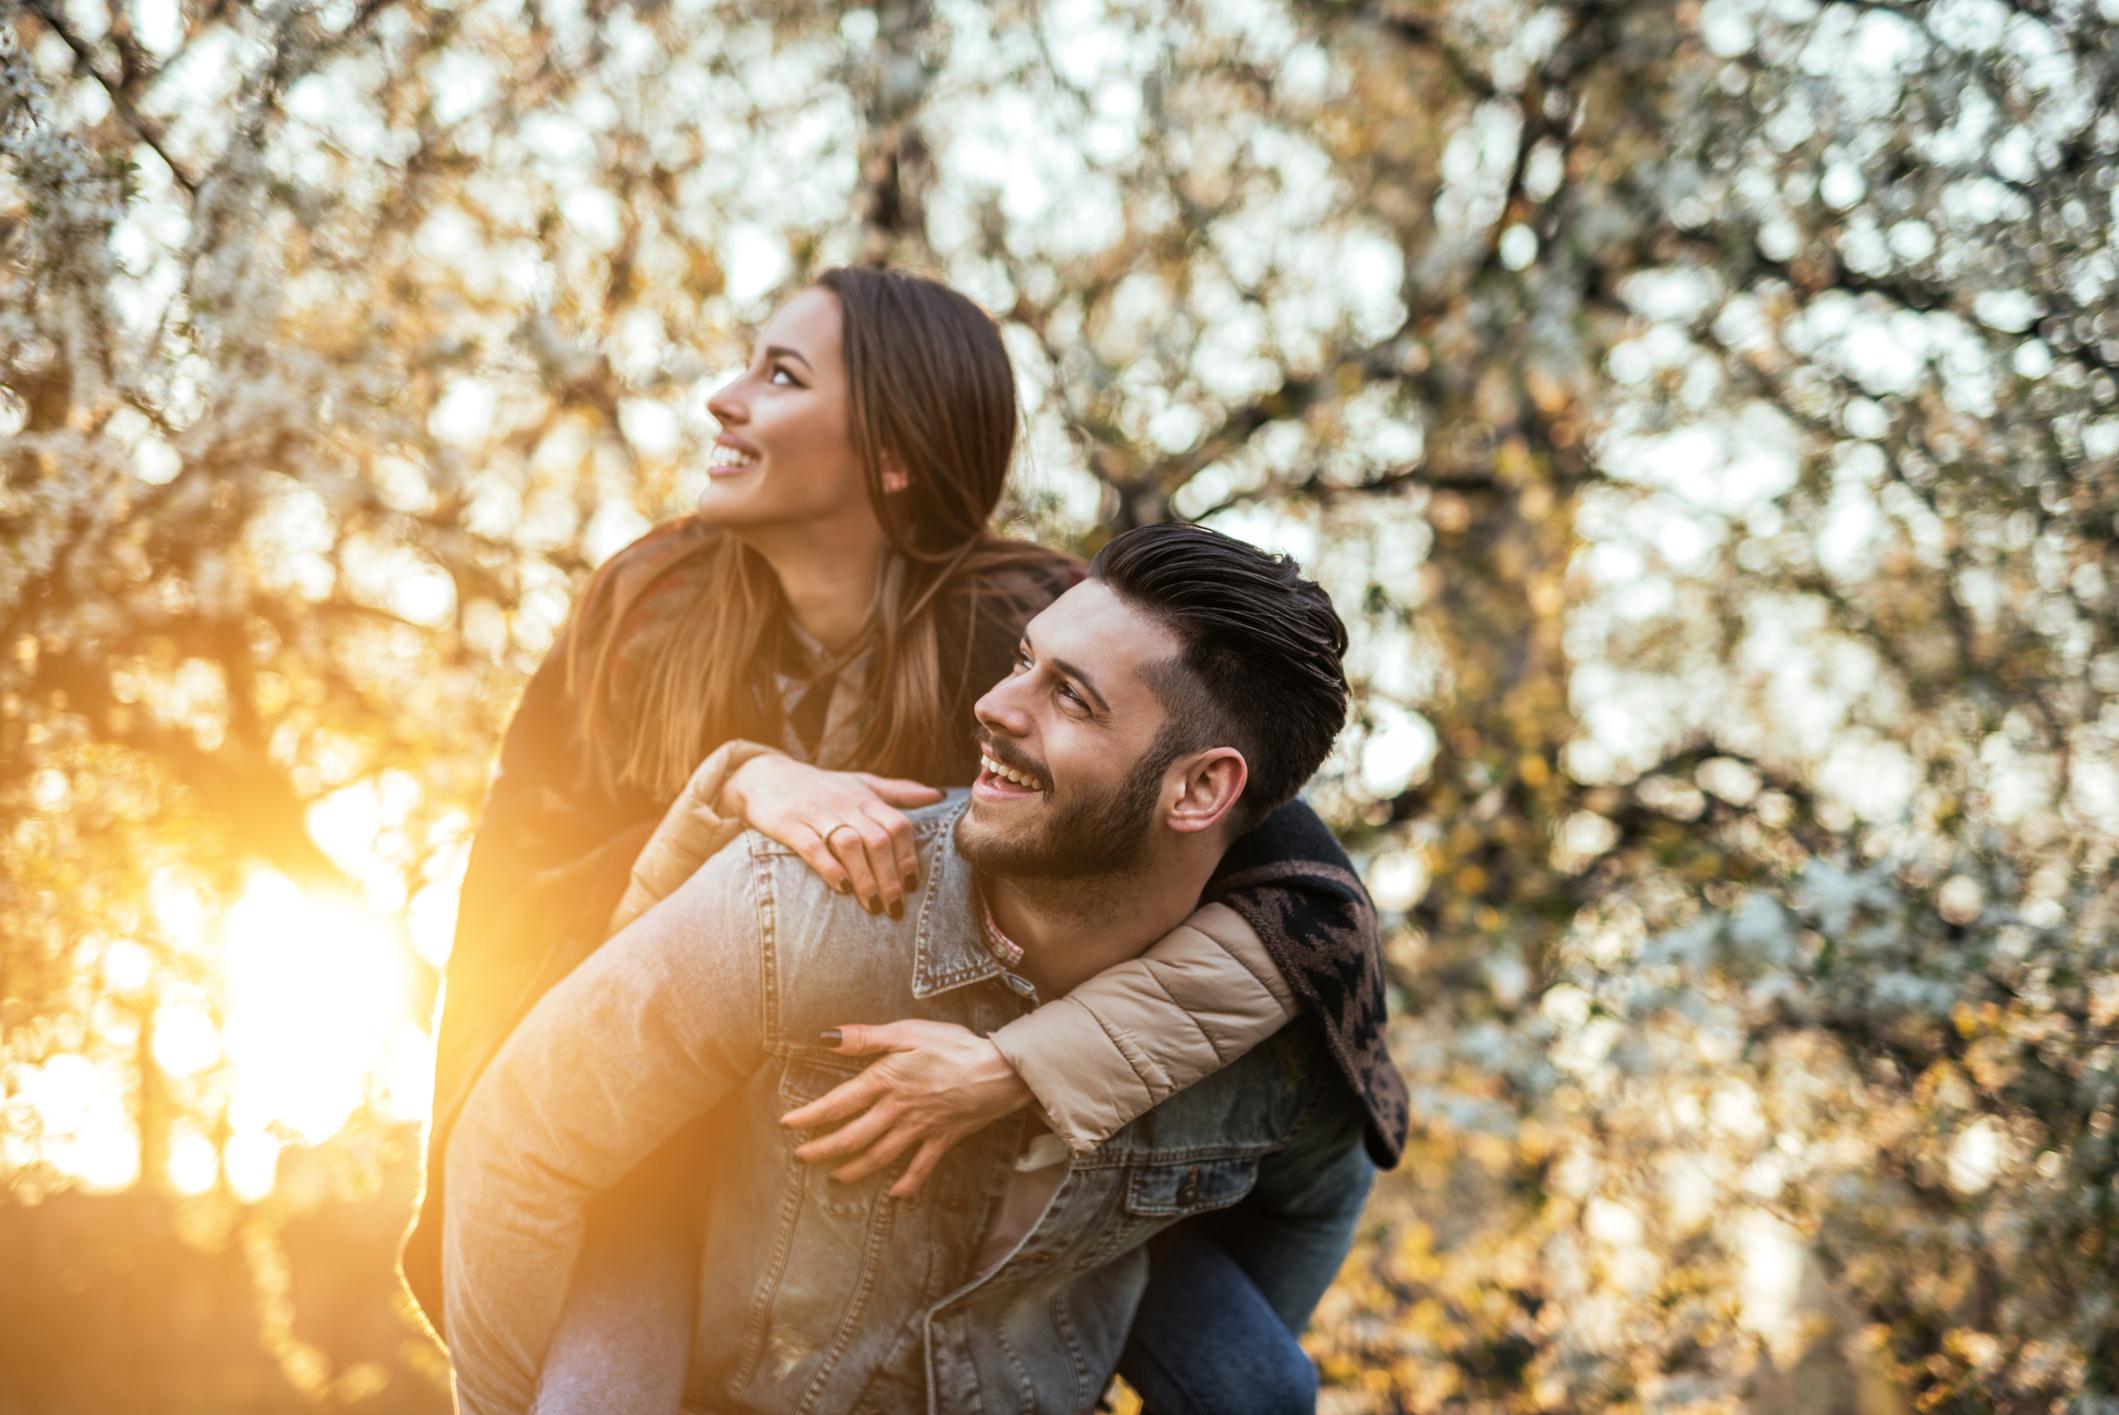 REYNA: True love or infatuation quiz